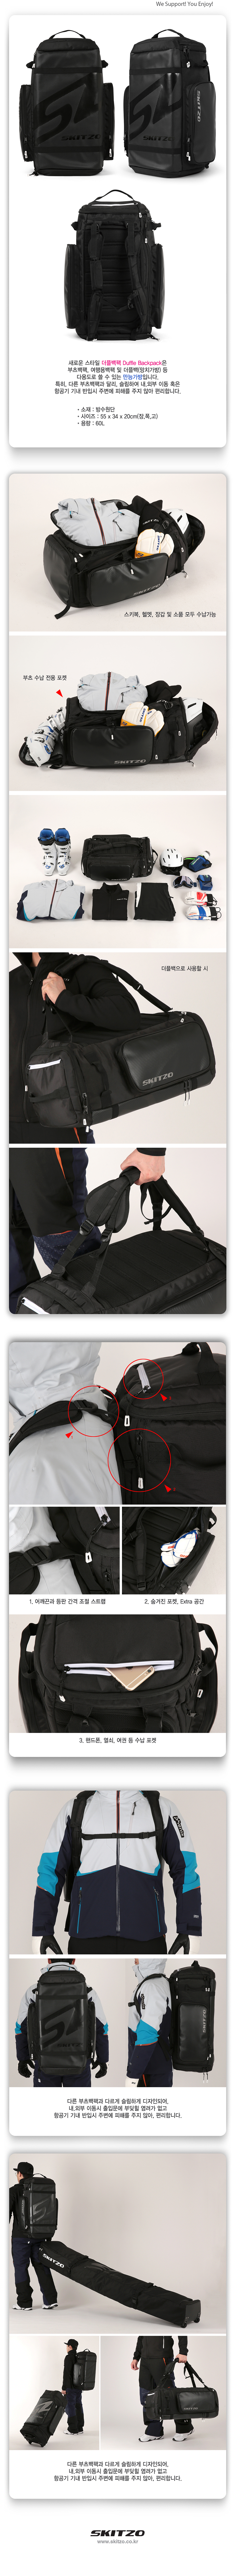 1920-Duffel-Backpack_Black.jpg